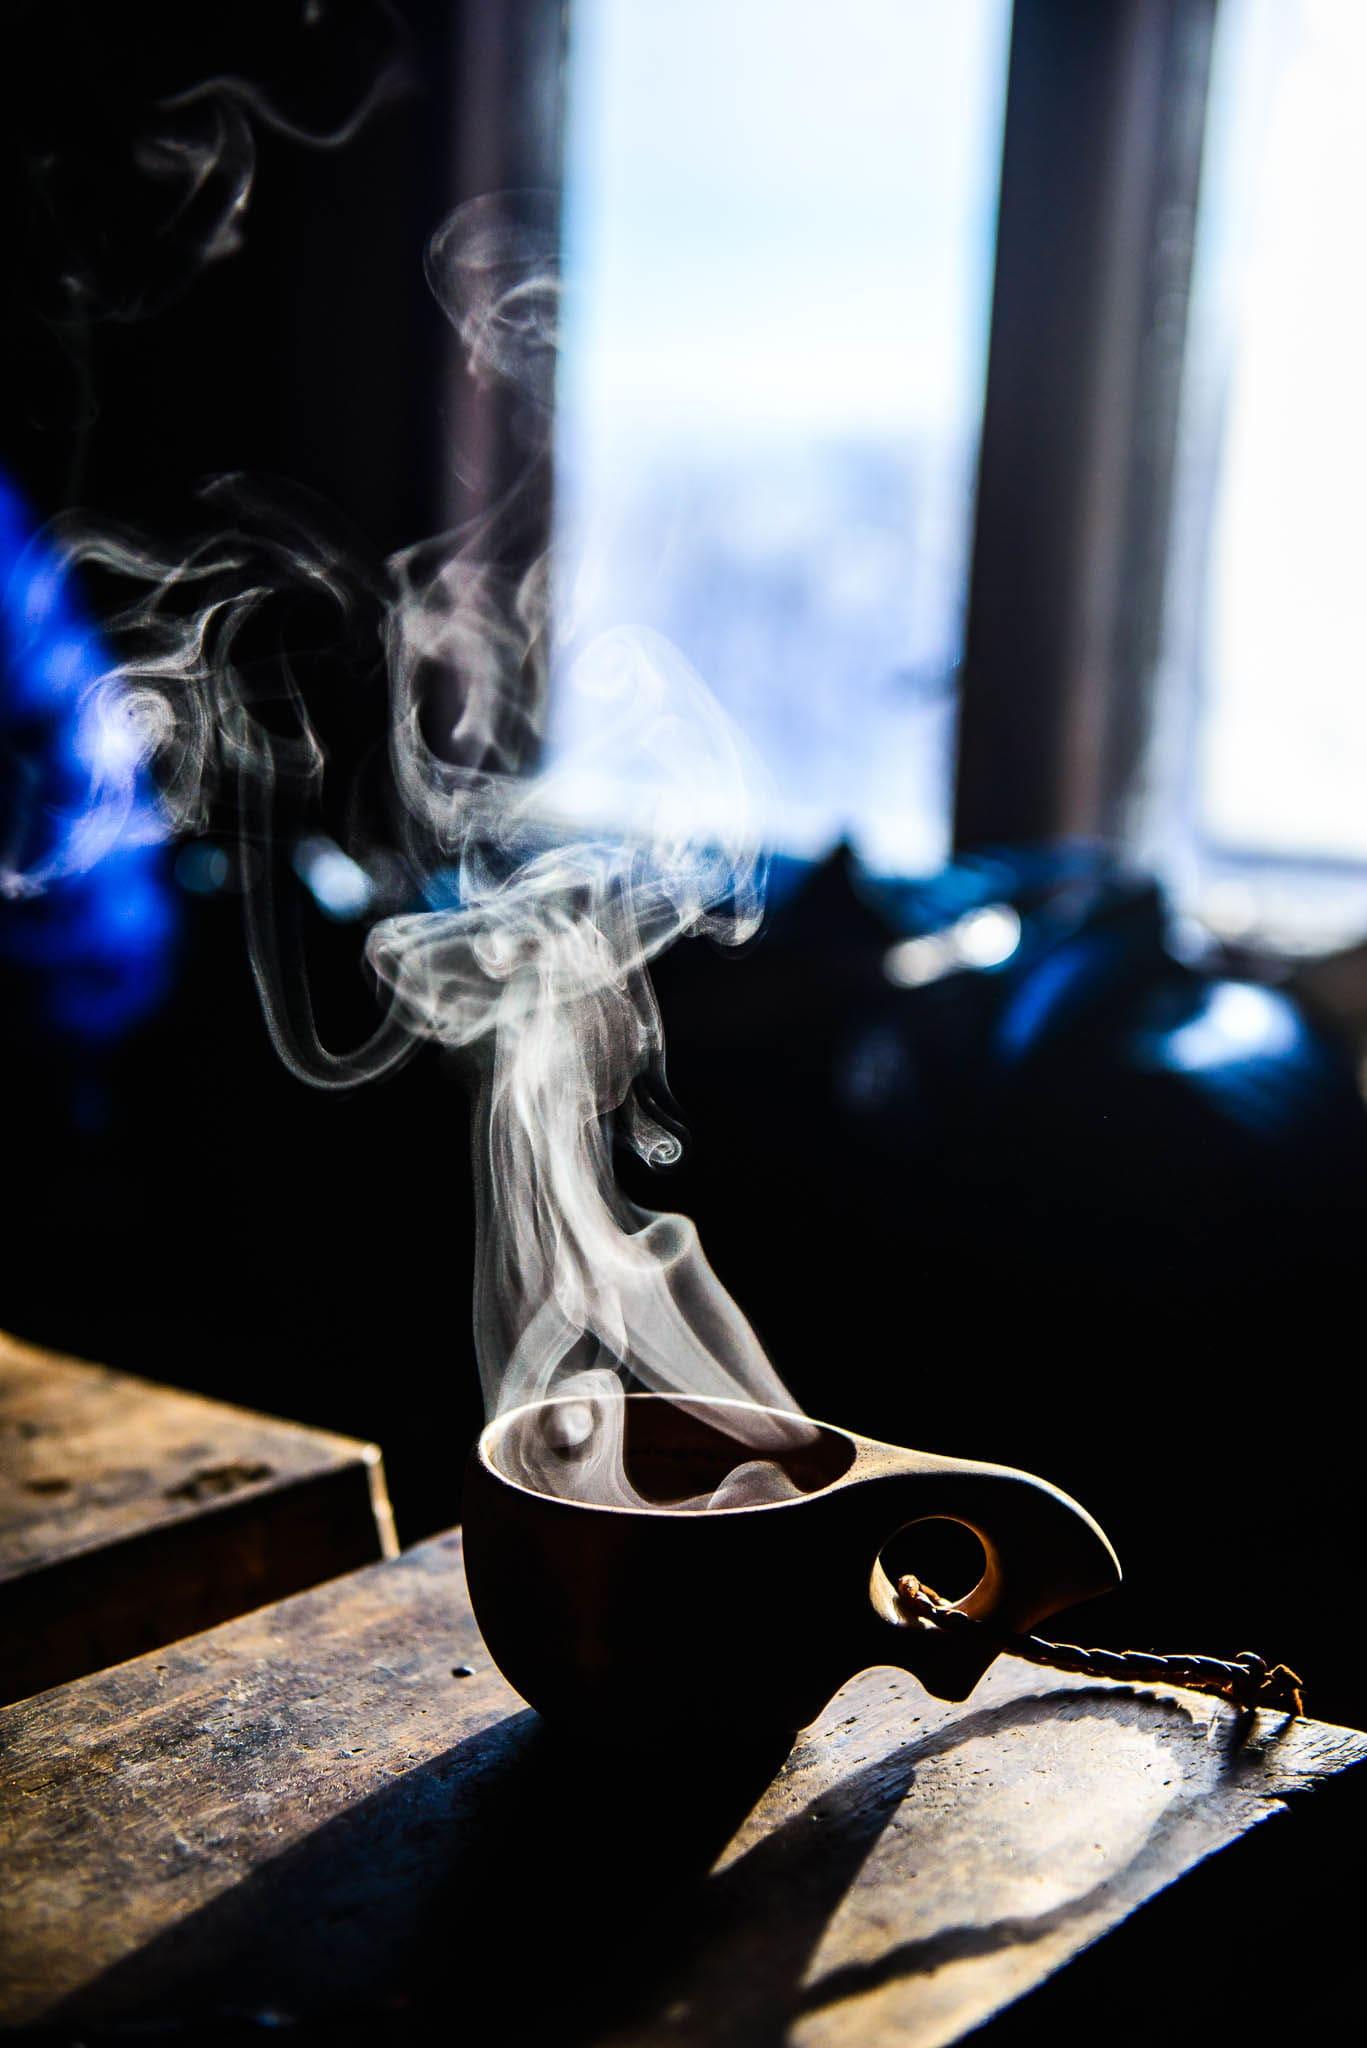 Steaming hot drink kuksa